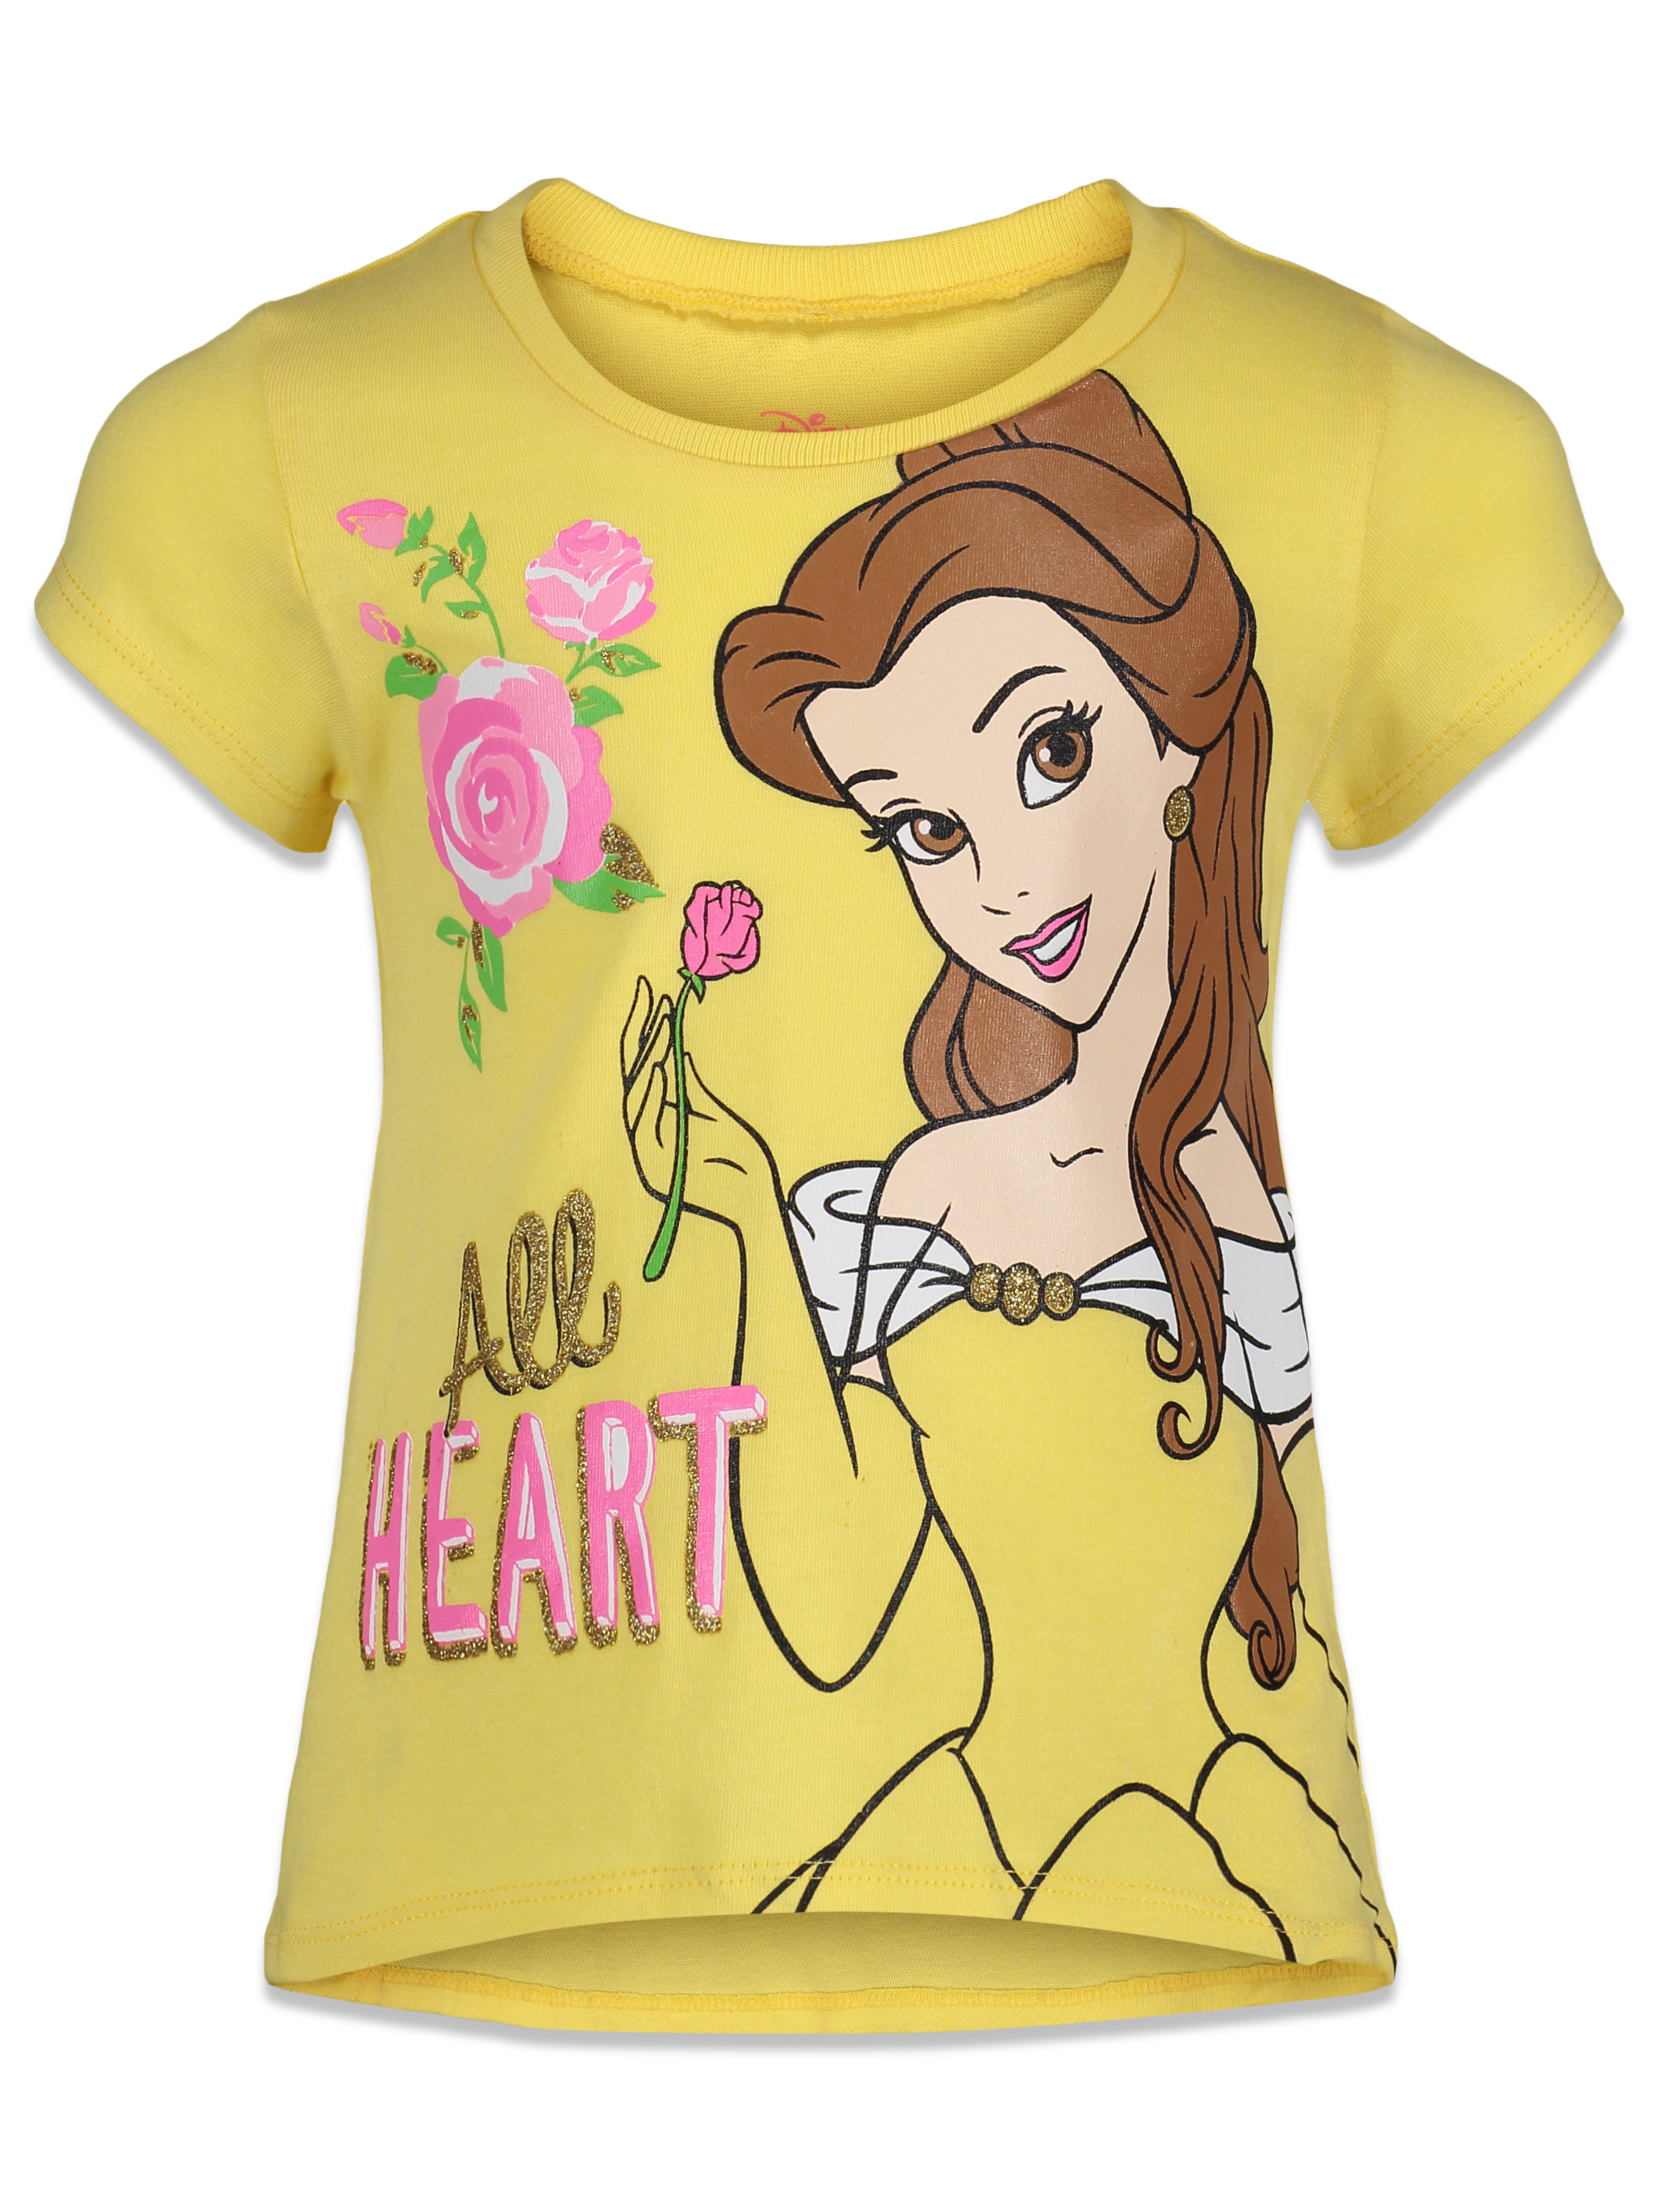 Disney Princesses Toddler Girls T-Shirts Cinderella Ariel More Various Sizes NWT